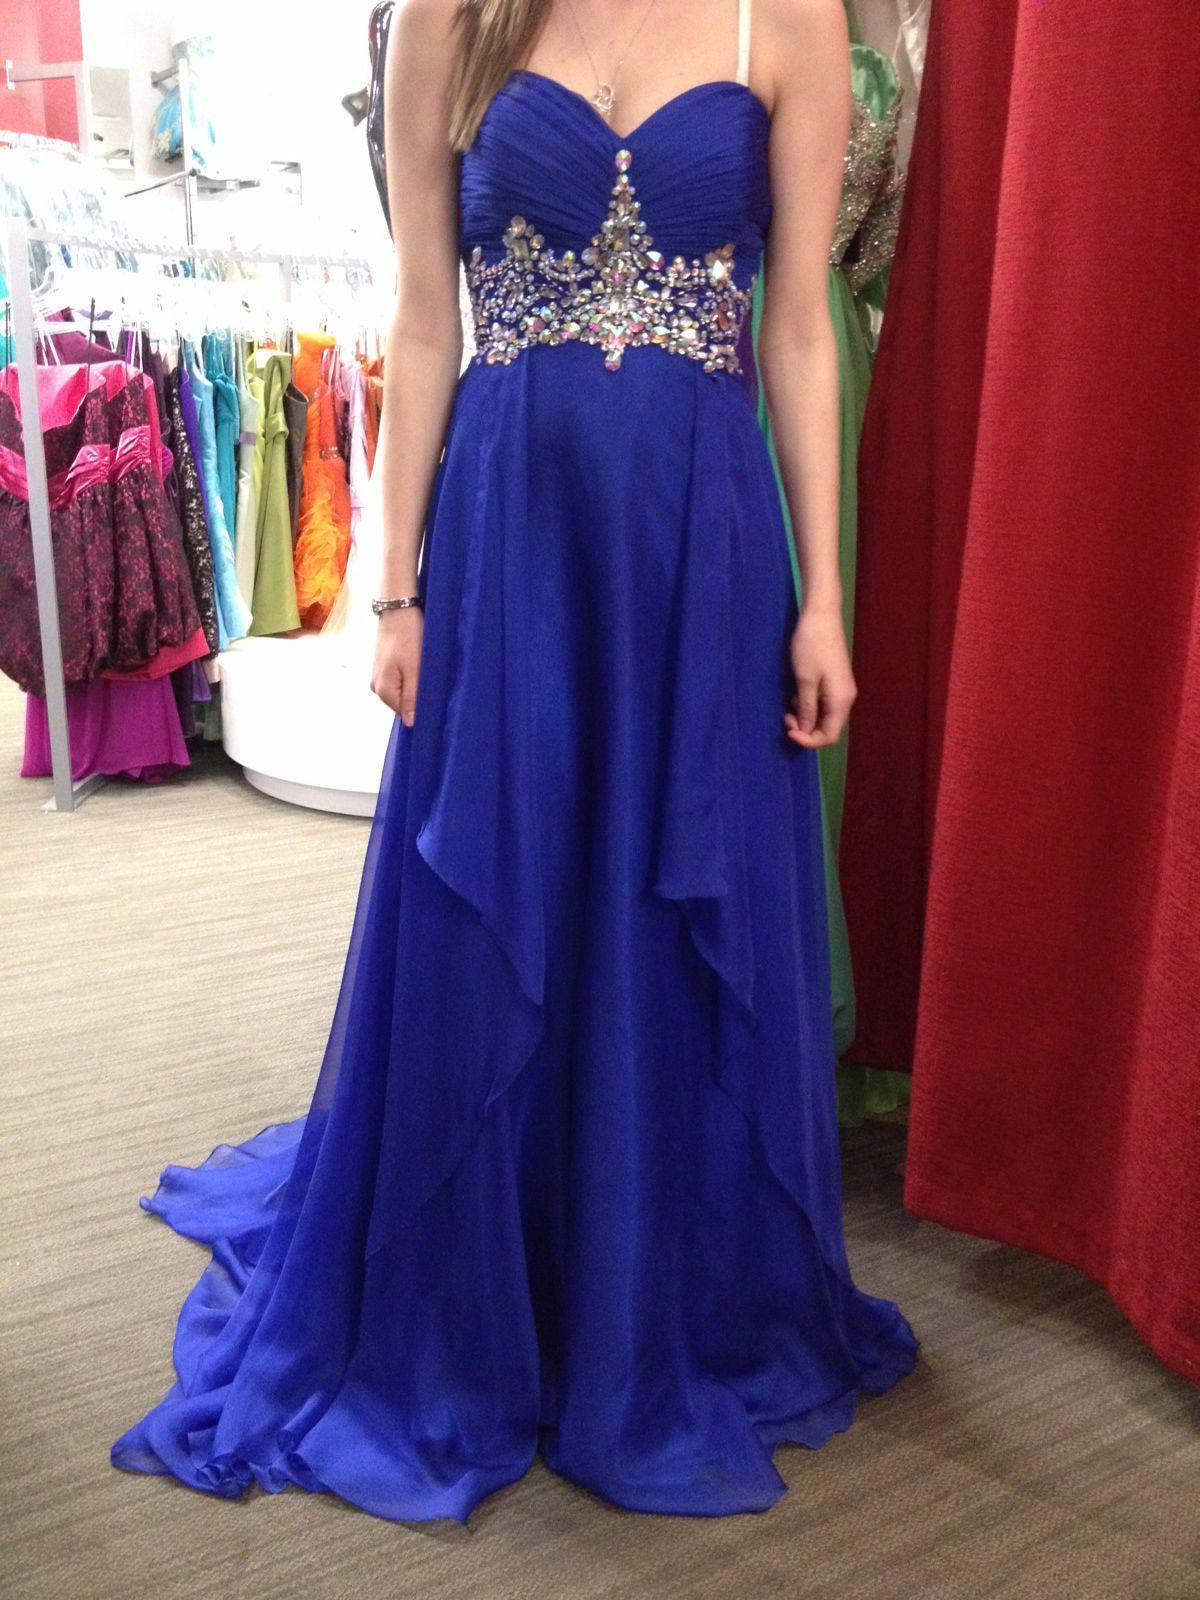 Blue grad prom dress dream dresses pinterest prom dream dress